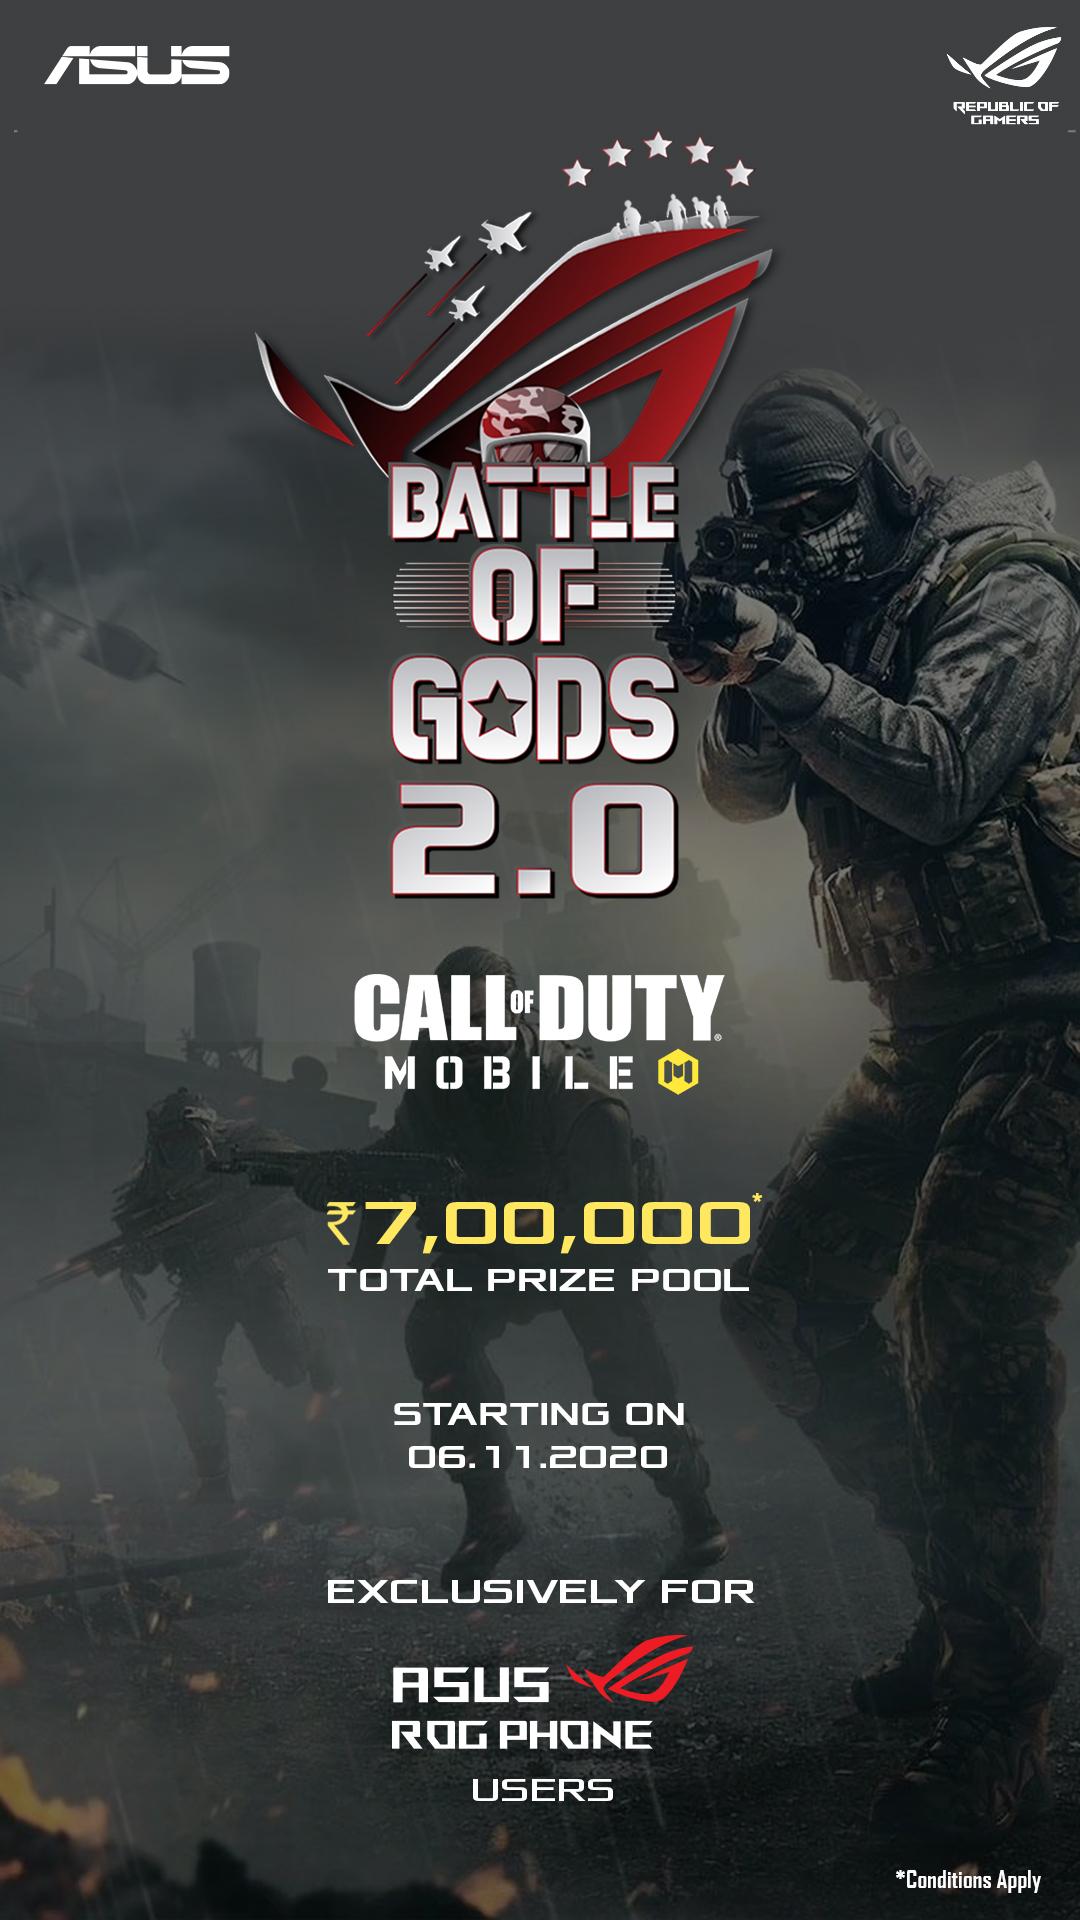 Asus Battle of Gods COD